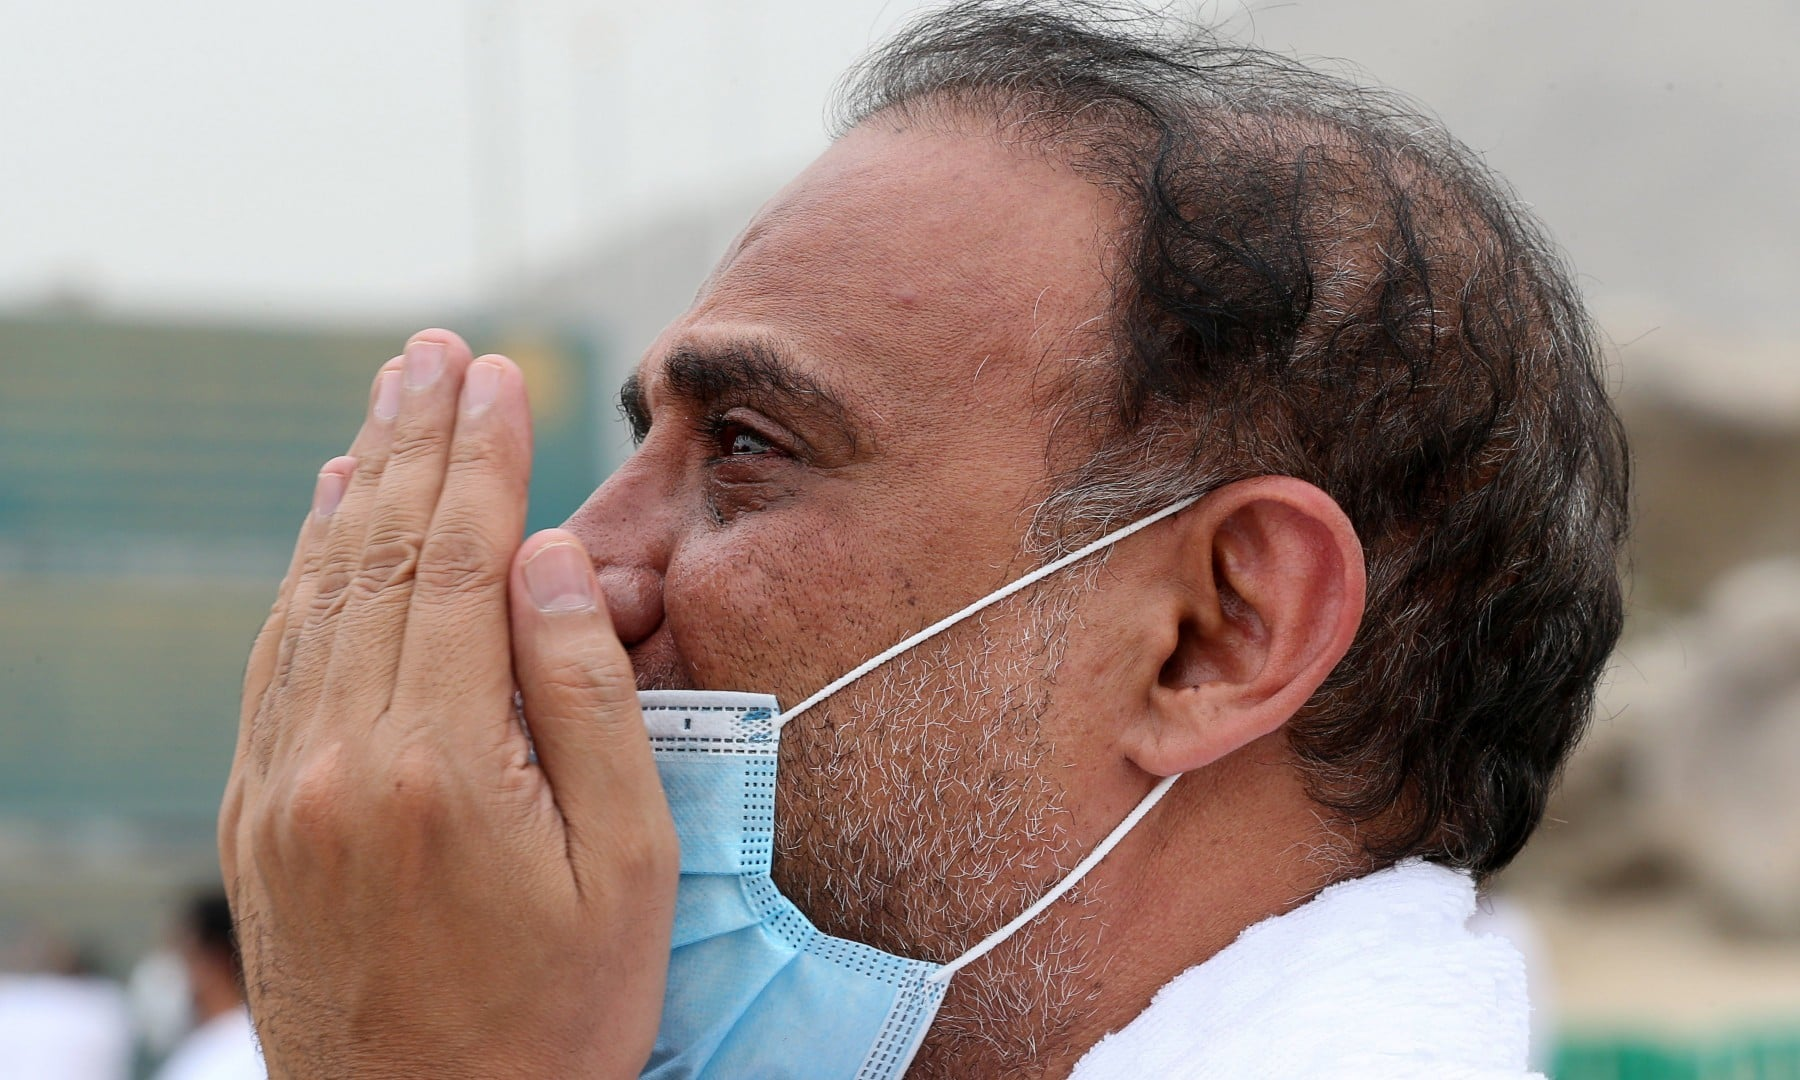 A Muslim pilgrim prays at the plain of Arafat during the annual Haj pilgrimage on July 19. — Reuters